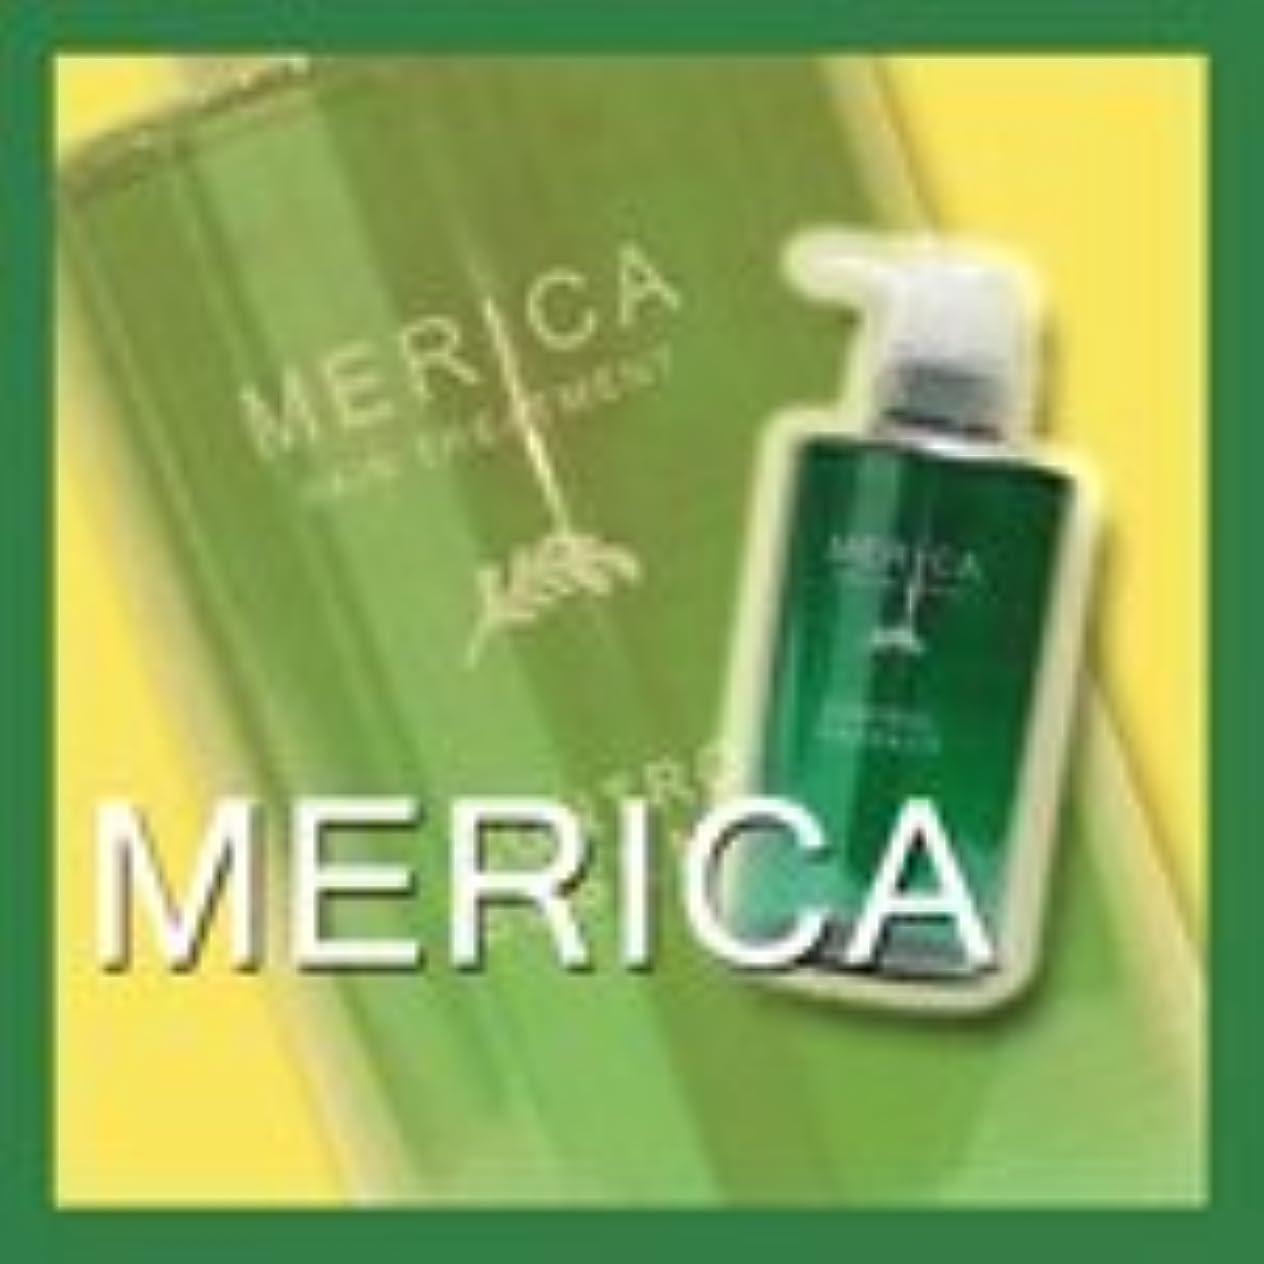 MERICA メリカ スキントリートメントS 500ml 医薬部外品 【白い 化粧水】